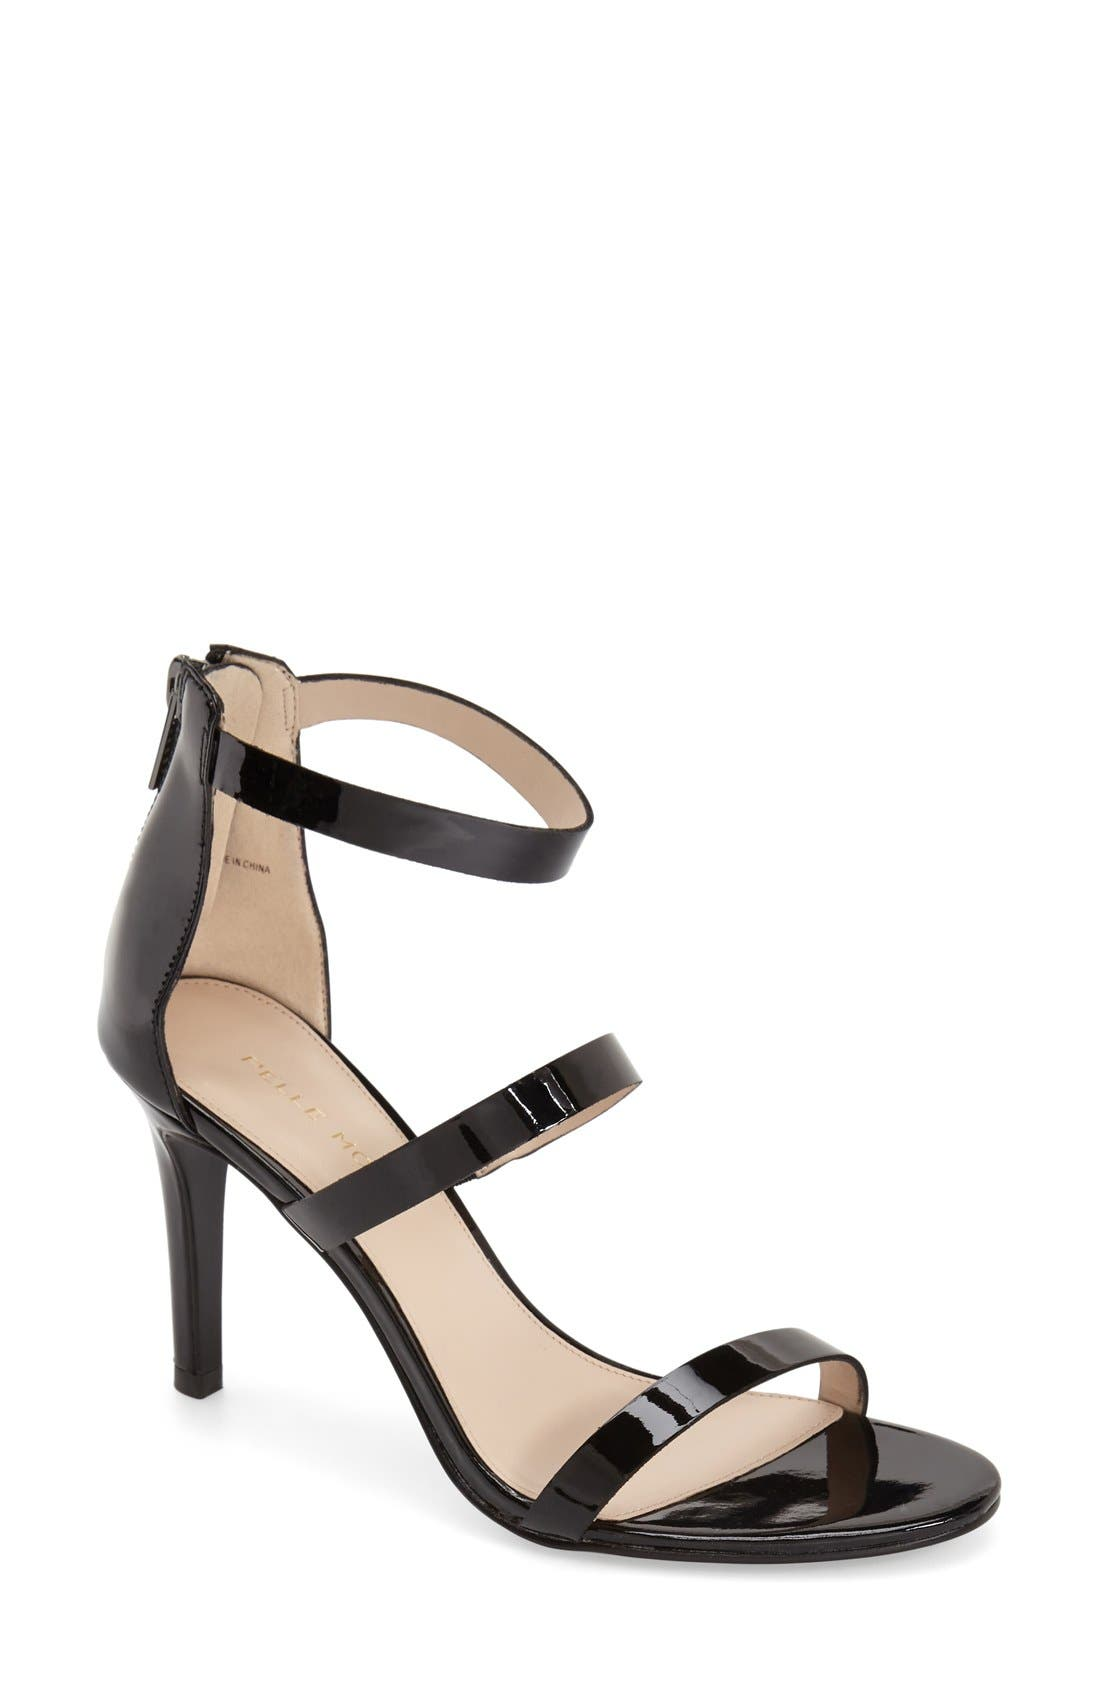 'Dalia' Three Strap Sandal,                             Main thumbnail 1, color,                             001